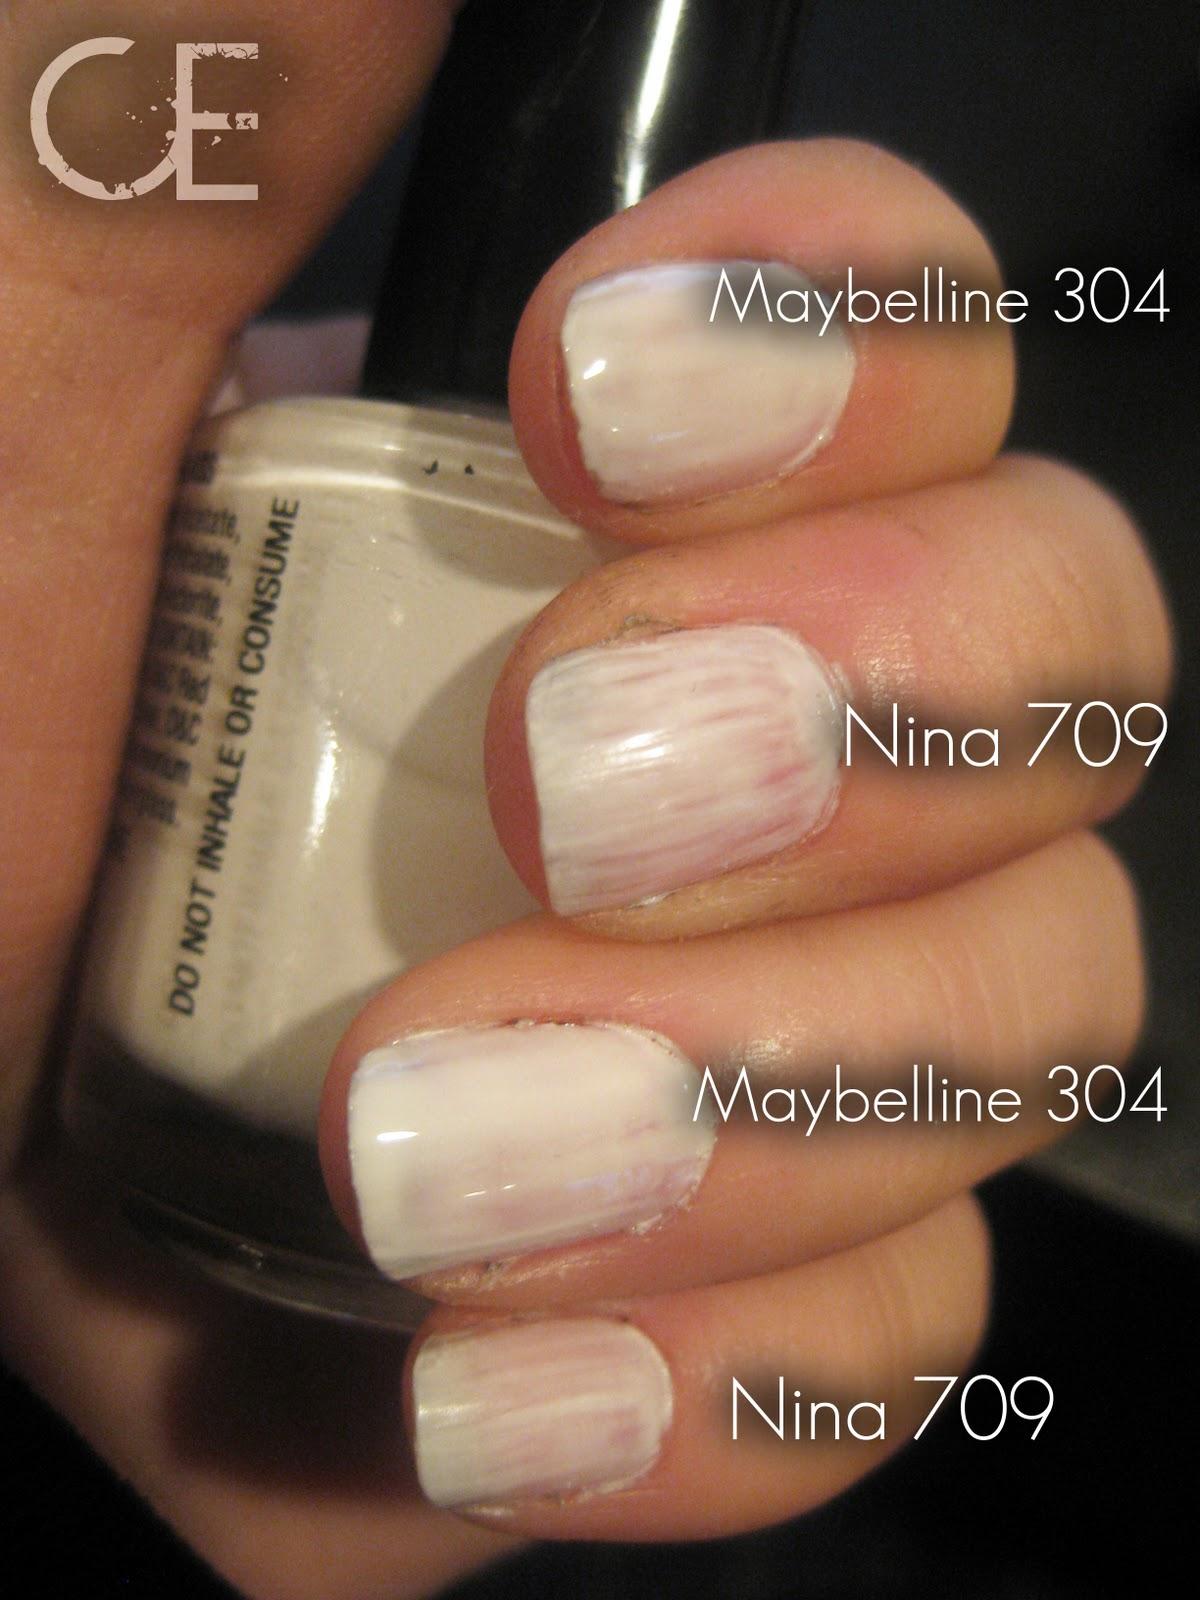 Makeup, etc!: Versus: White Nail Polish